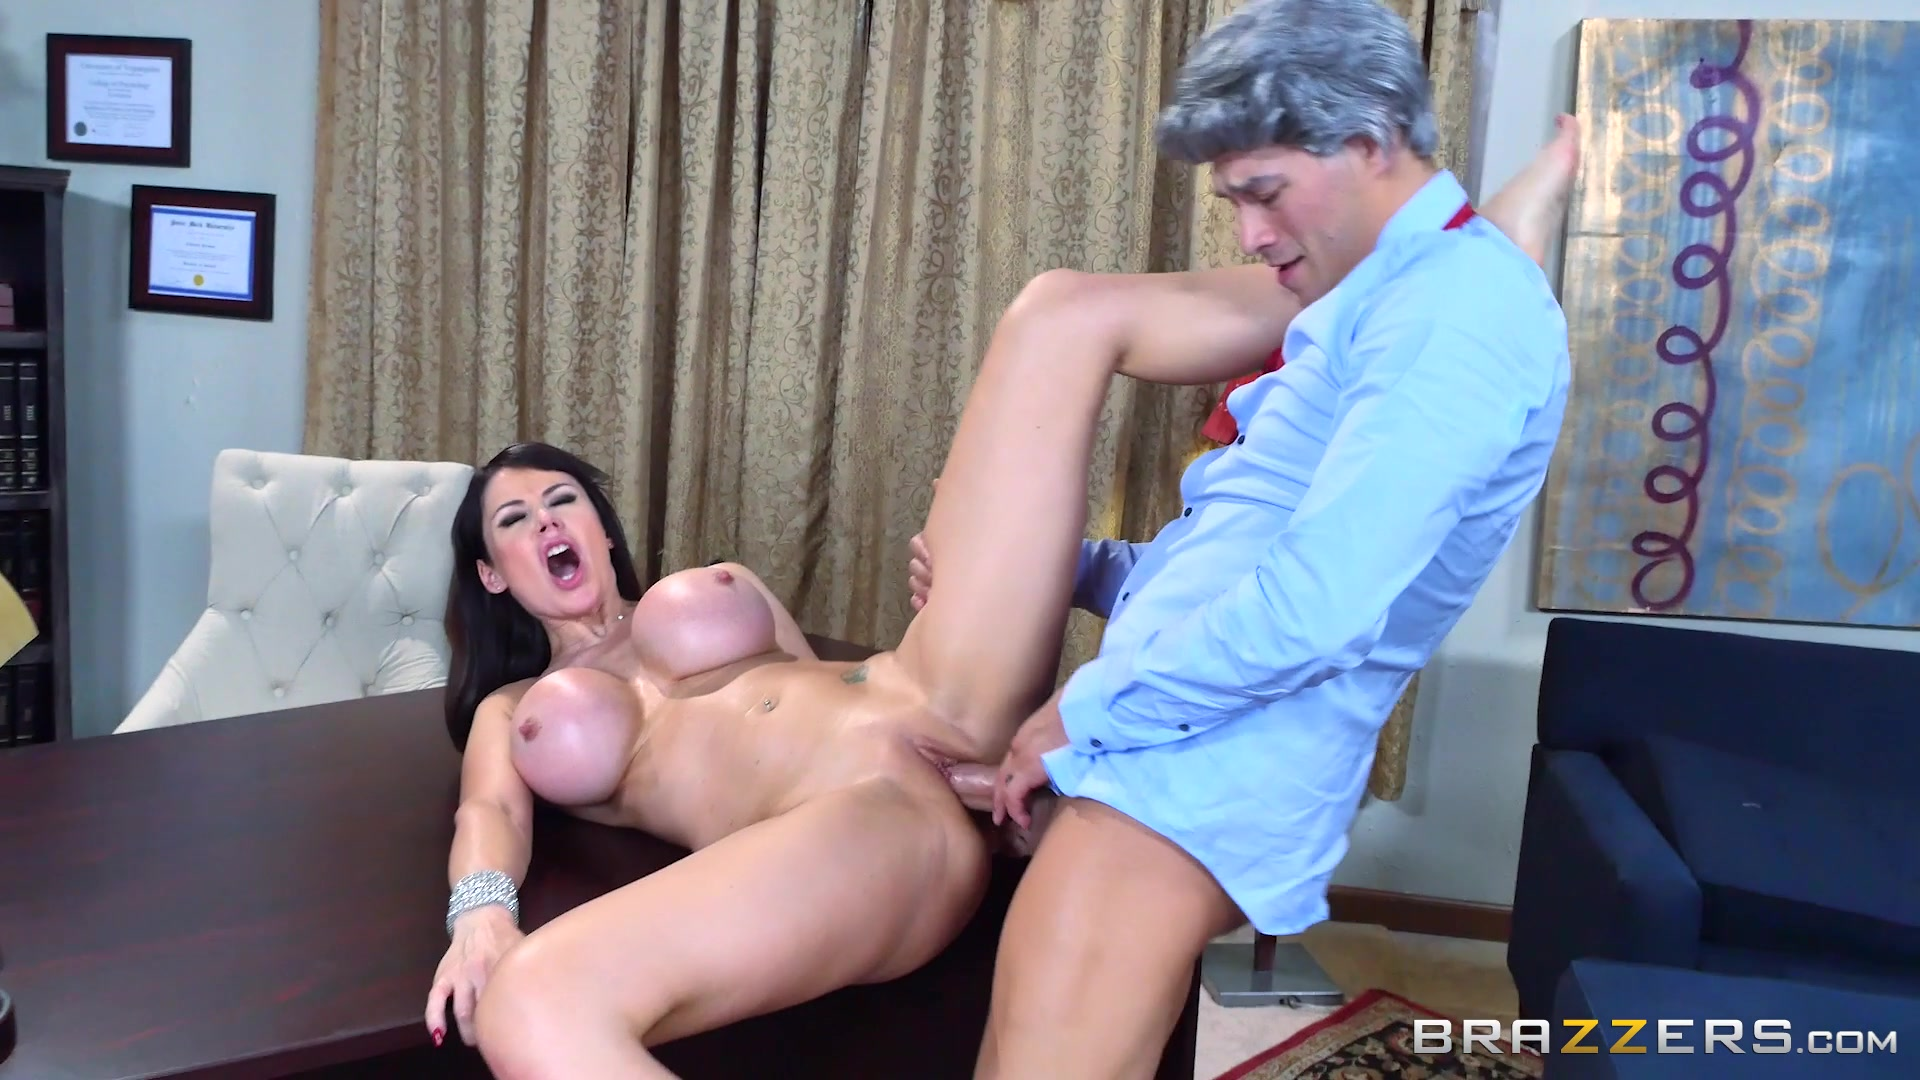 Busty Brunette Eva Karera Gets Her Ass Hammered by a Hung Stud Starring: Eva Karera Length: 30 min